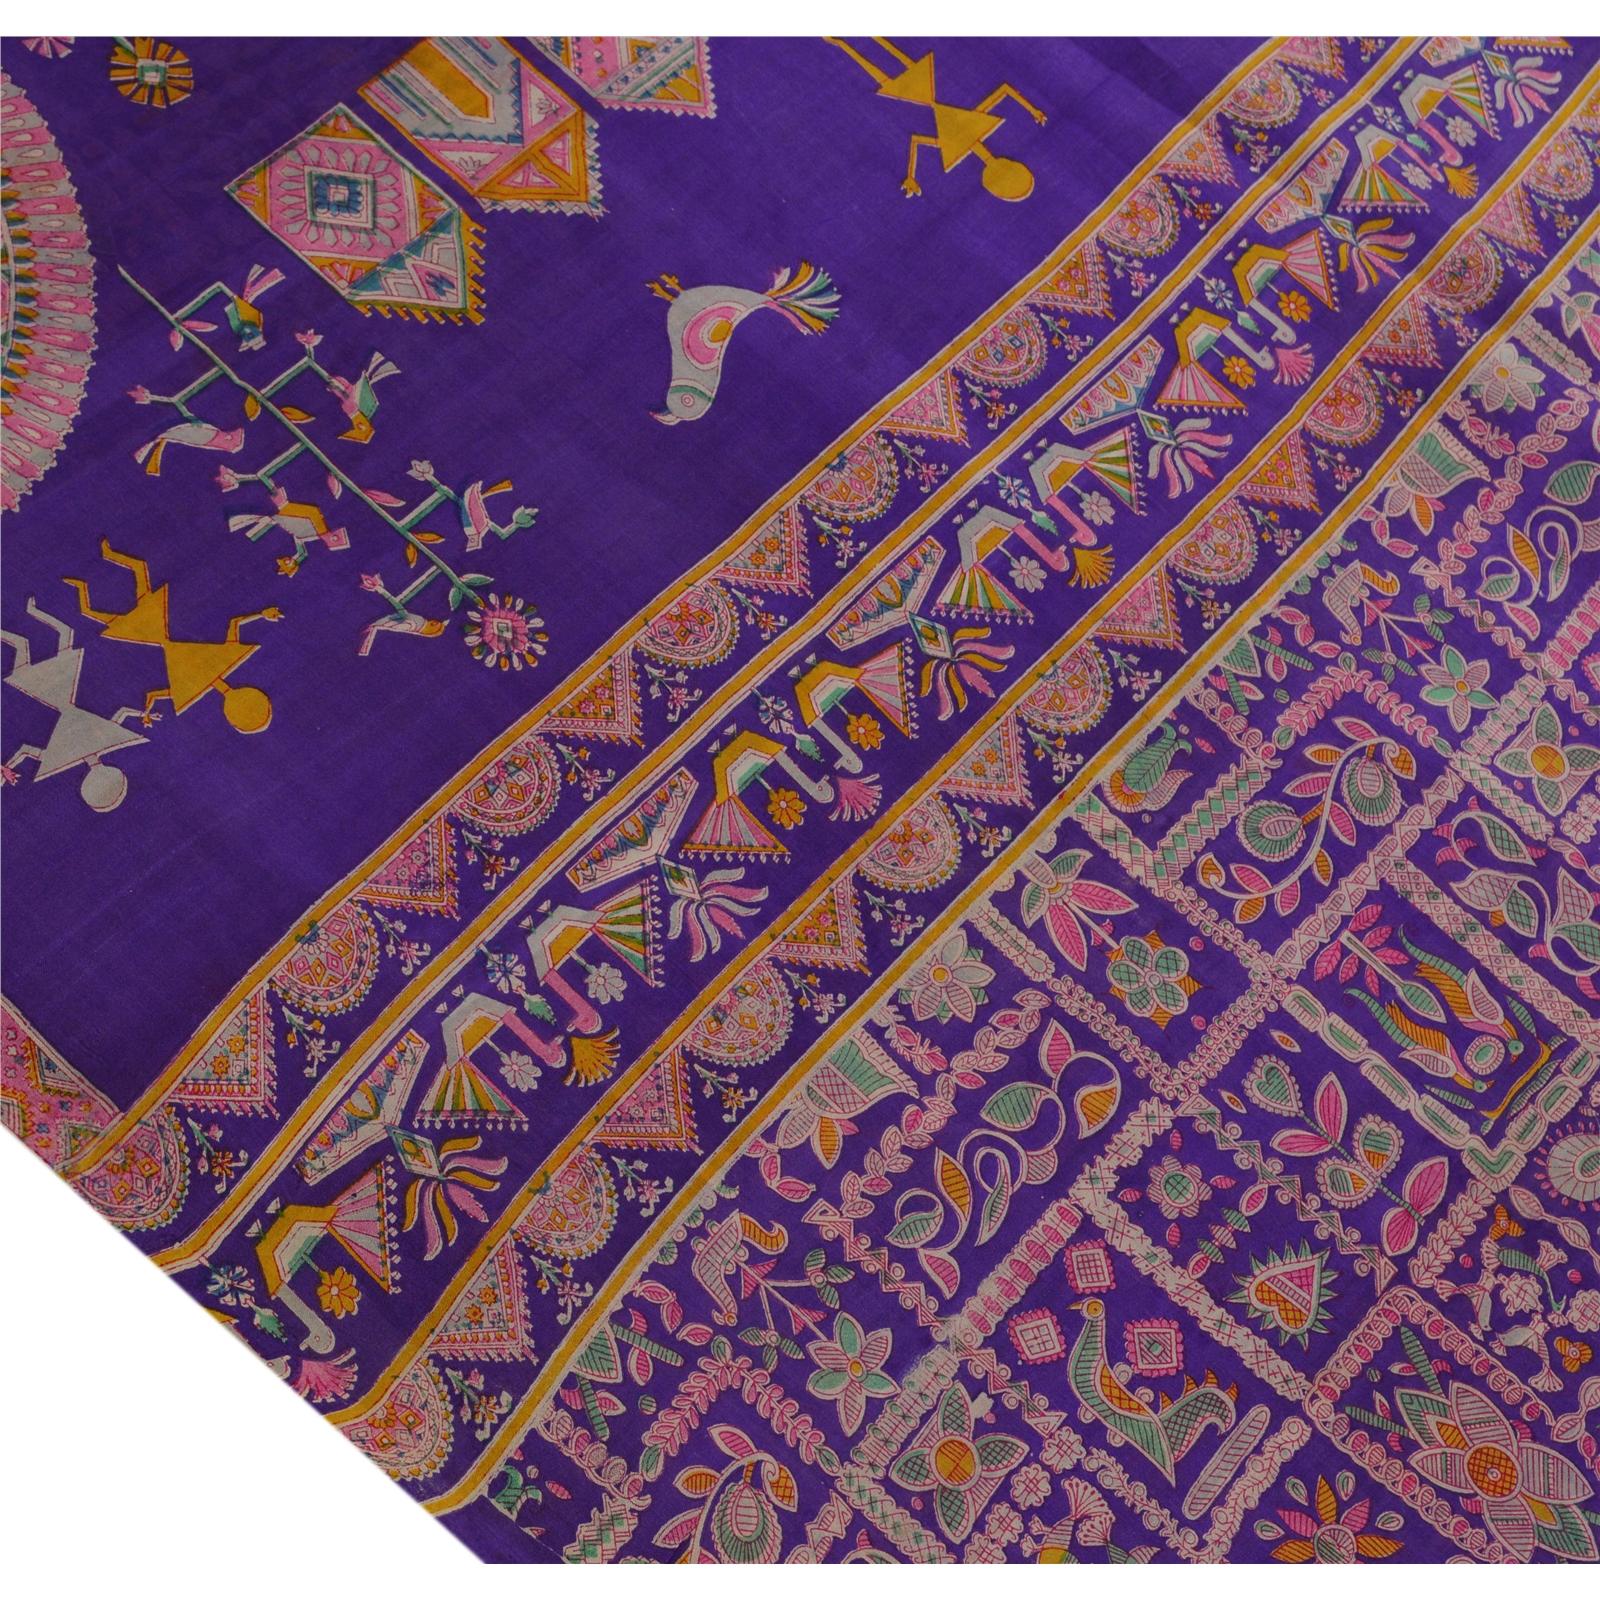 Vintage Indian Warli Printed Saree 100 Pure Silk Craft